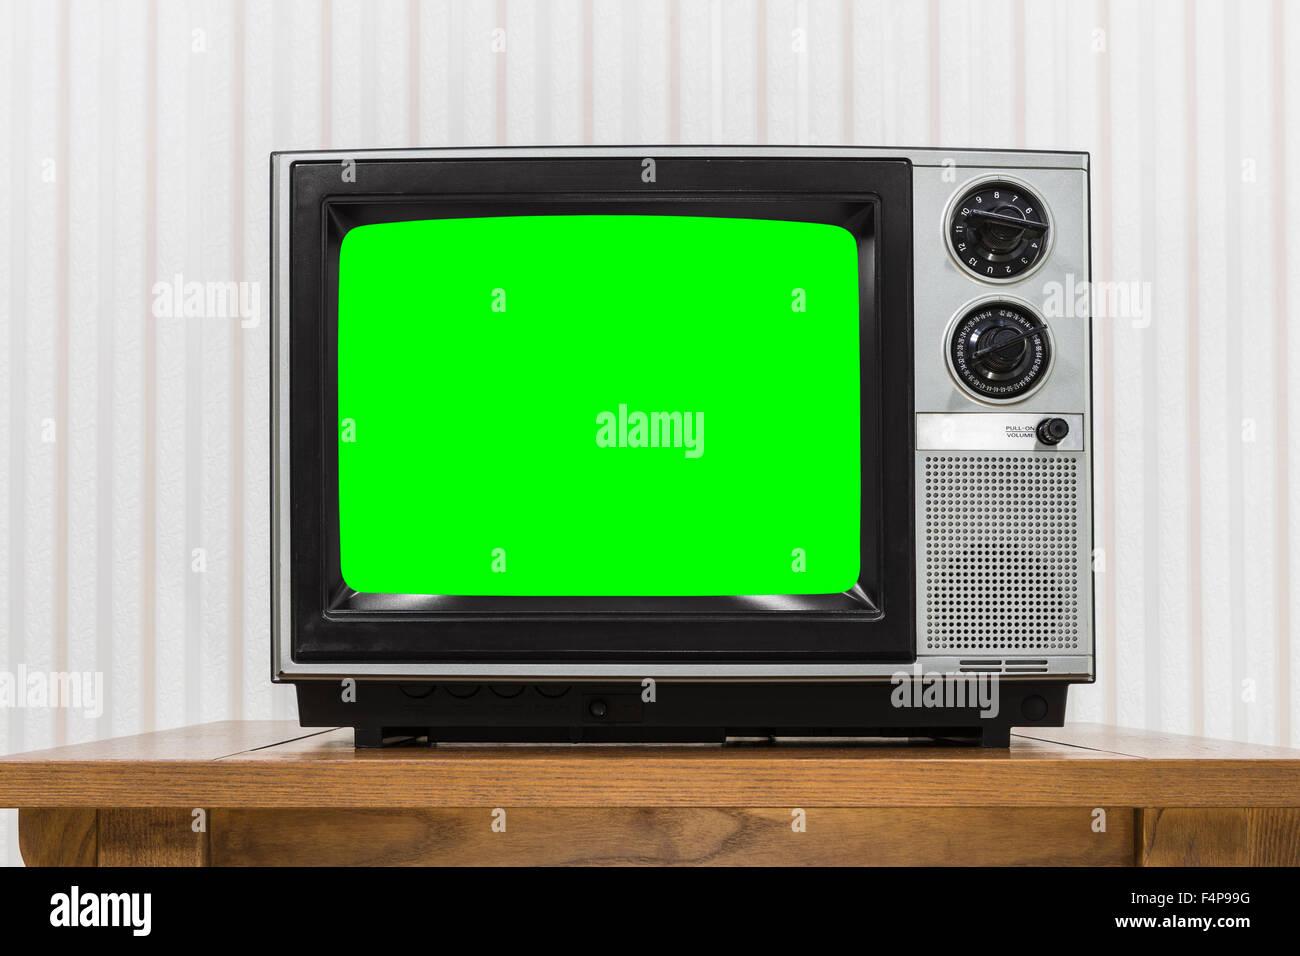 portable tv set stockfotos portable tv set bilder alamy. Black Bedroom Furniture Sets. Home Design Ideas